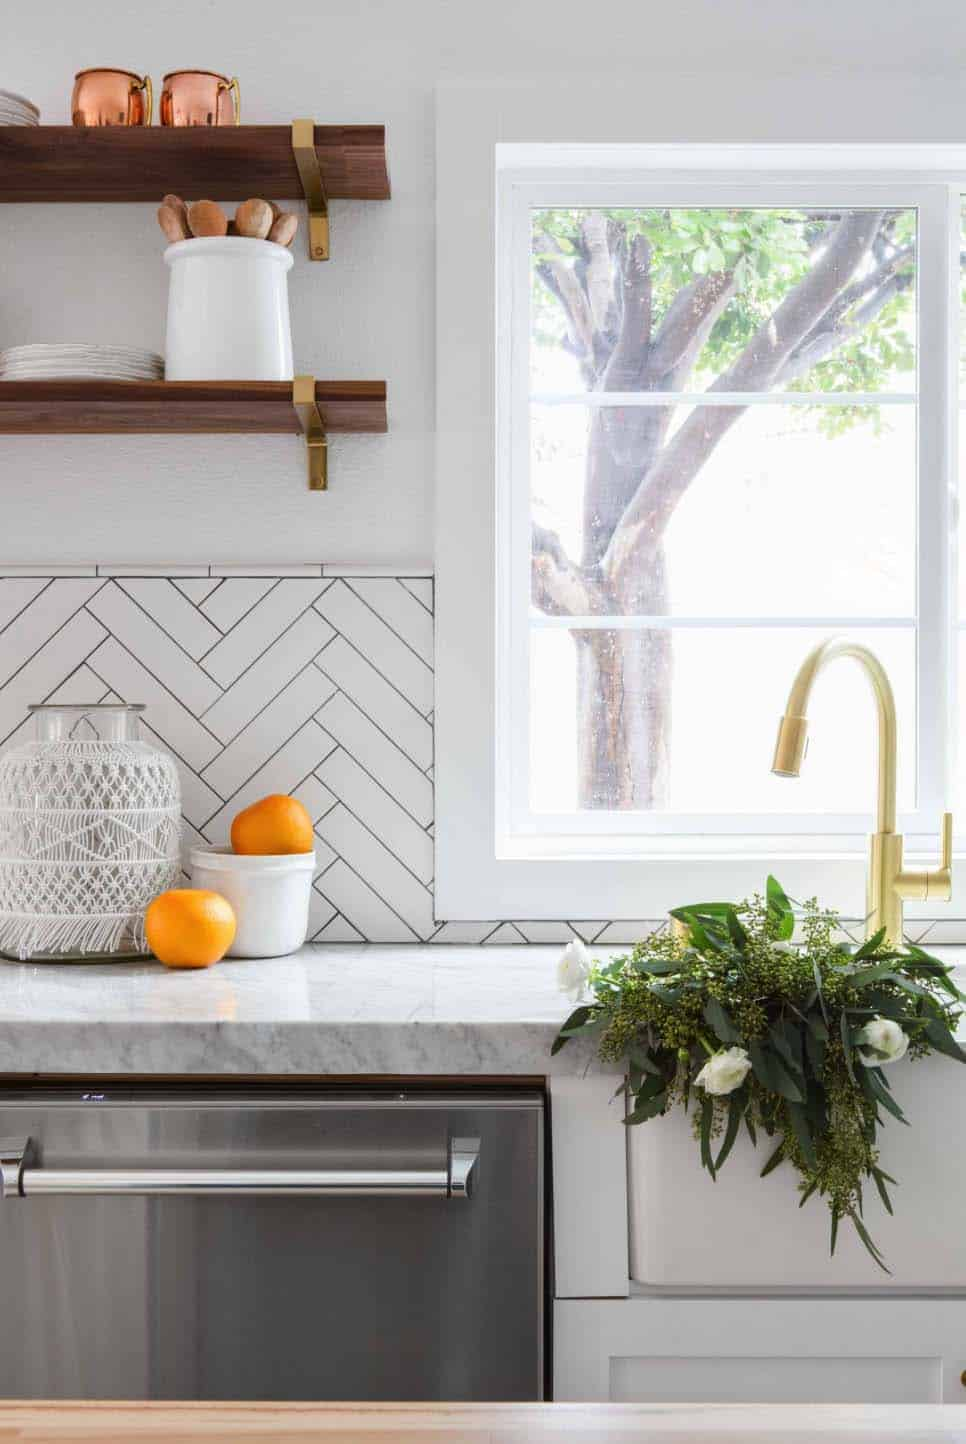 California Eclectic Home-Lindye Galloway Interiors-16-1 Kindesign